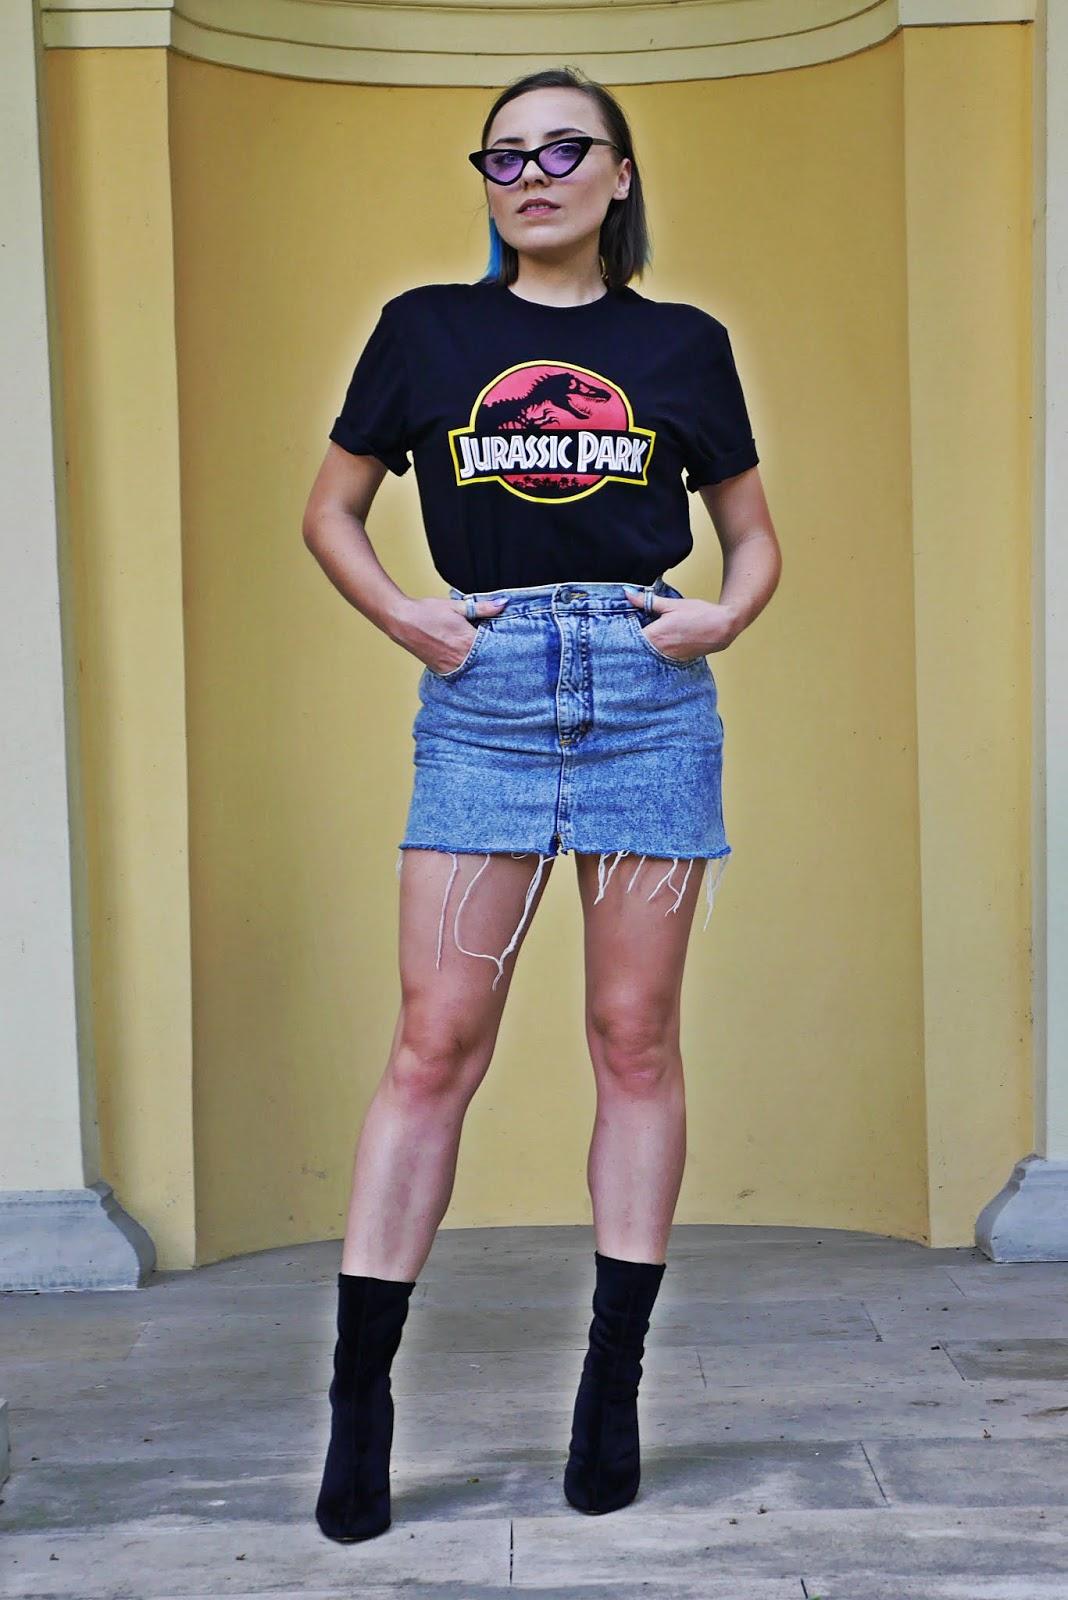 11_jurassic_park_t-hirt_spodnica_jeans_botki_skarpetki_renee_karyn_blog_modowy_080718